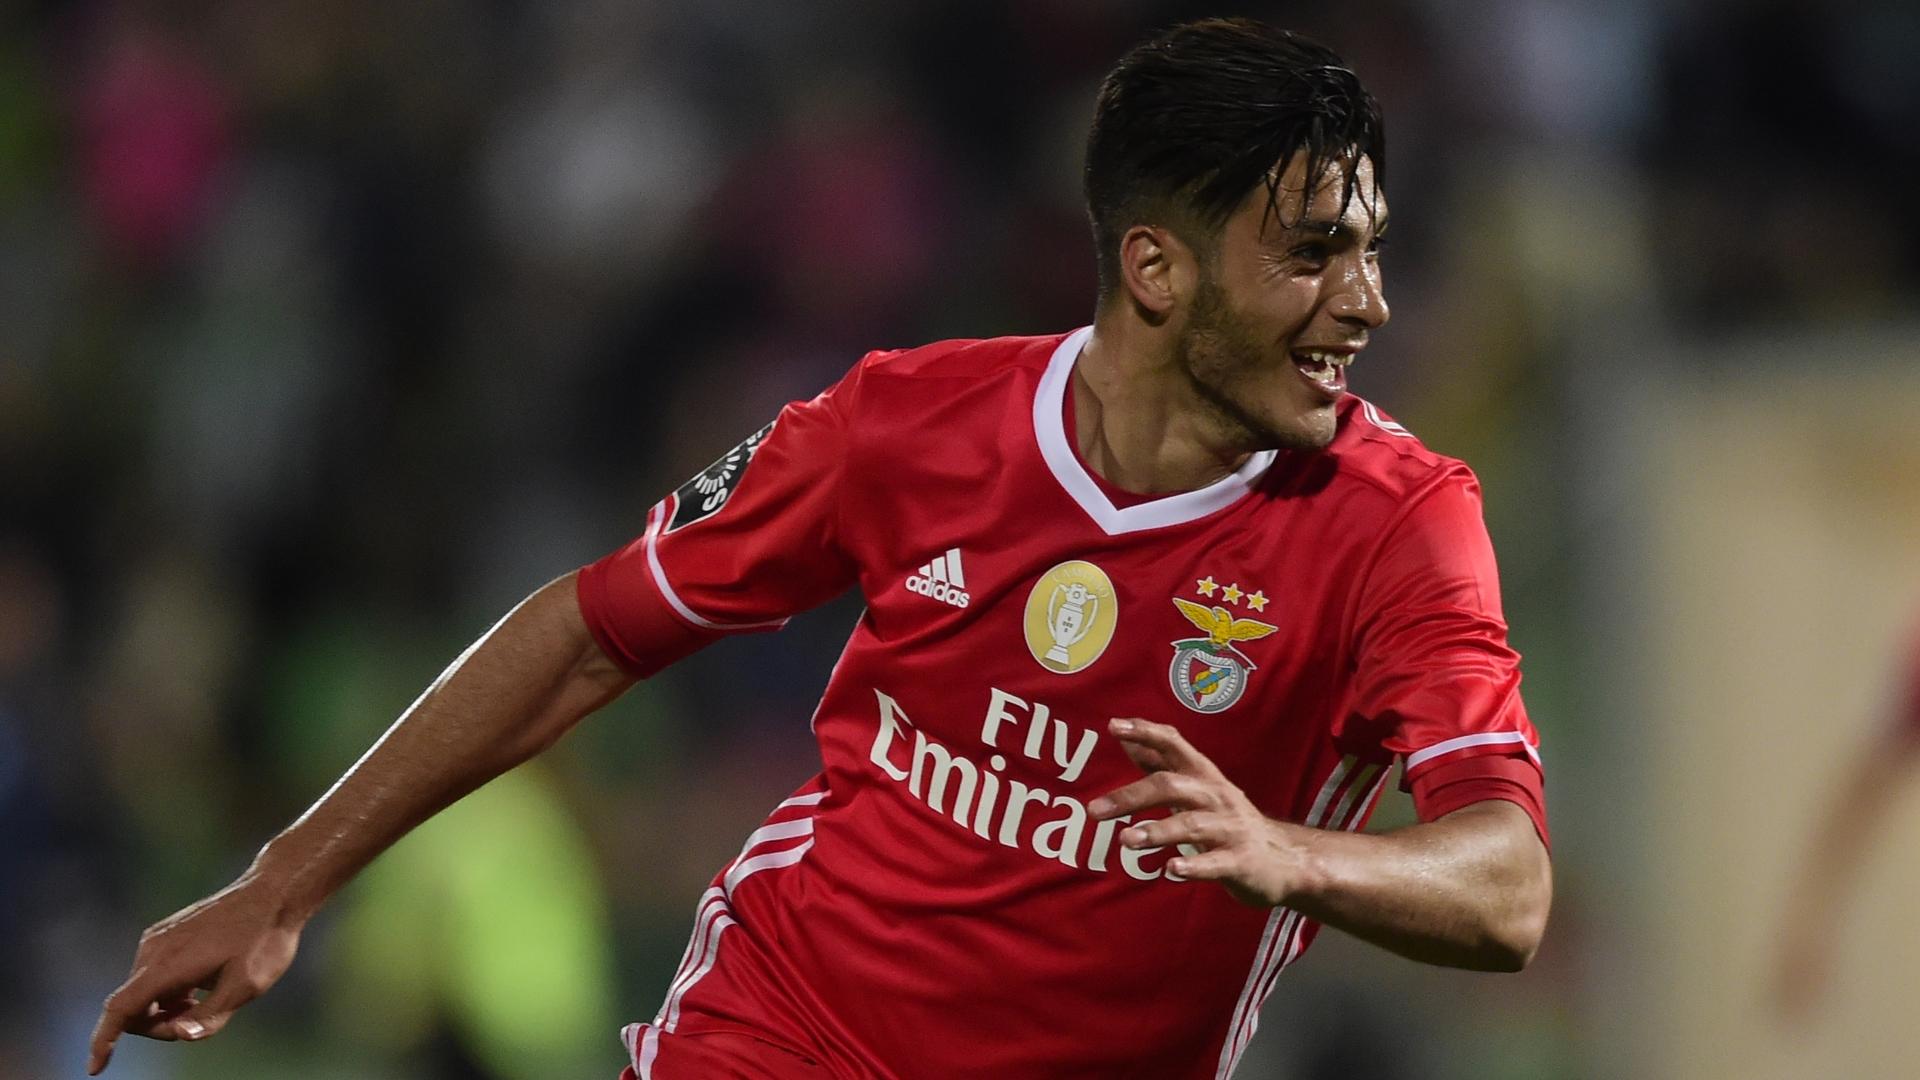 Raul Jiminez, Benfica